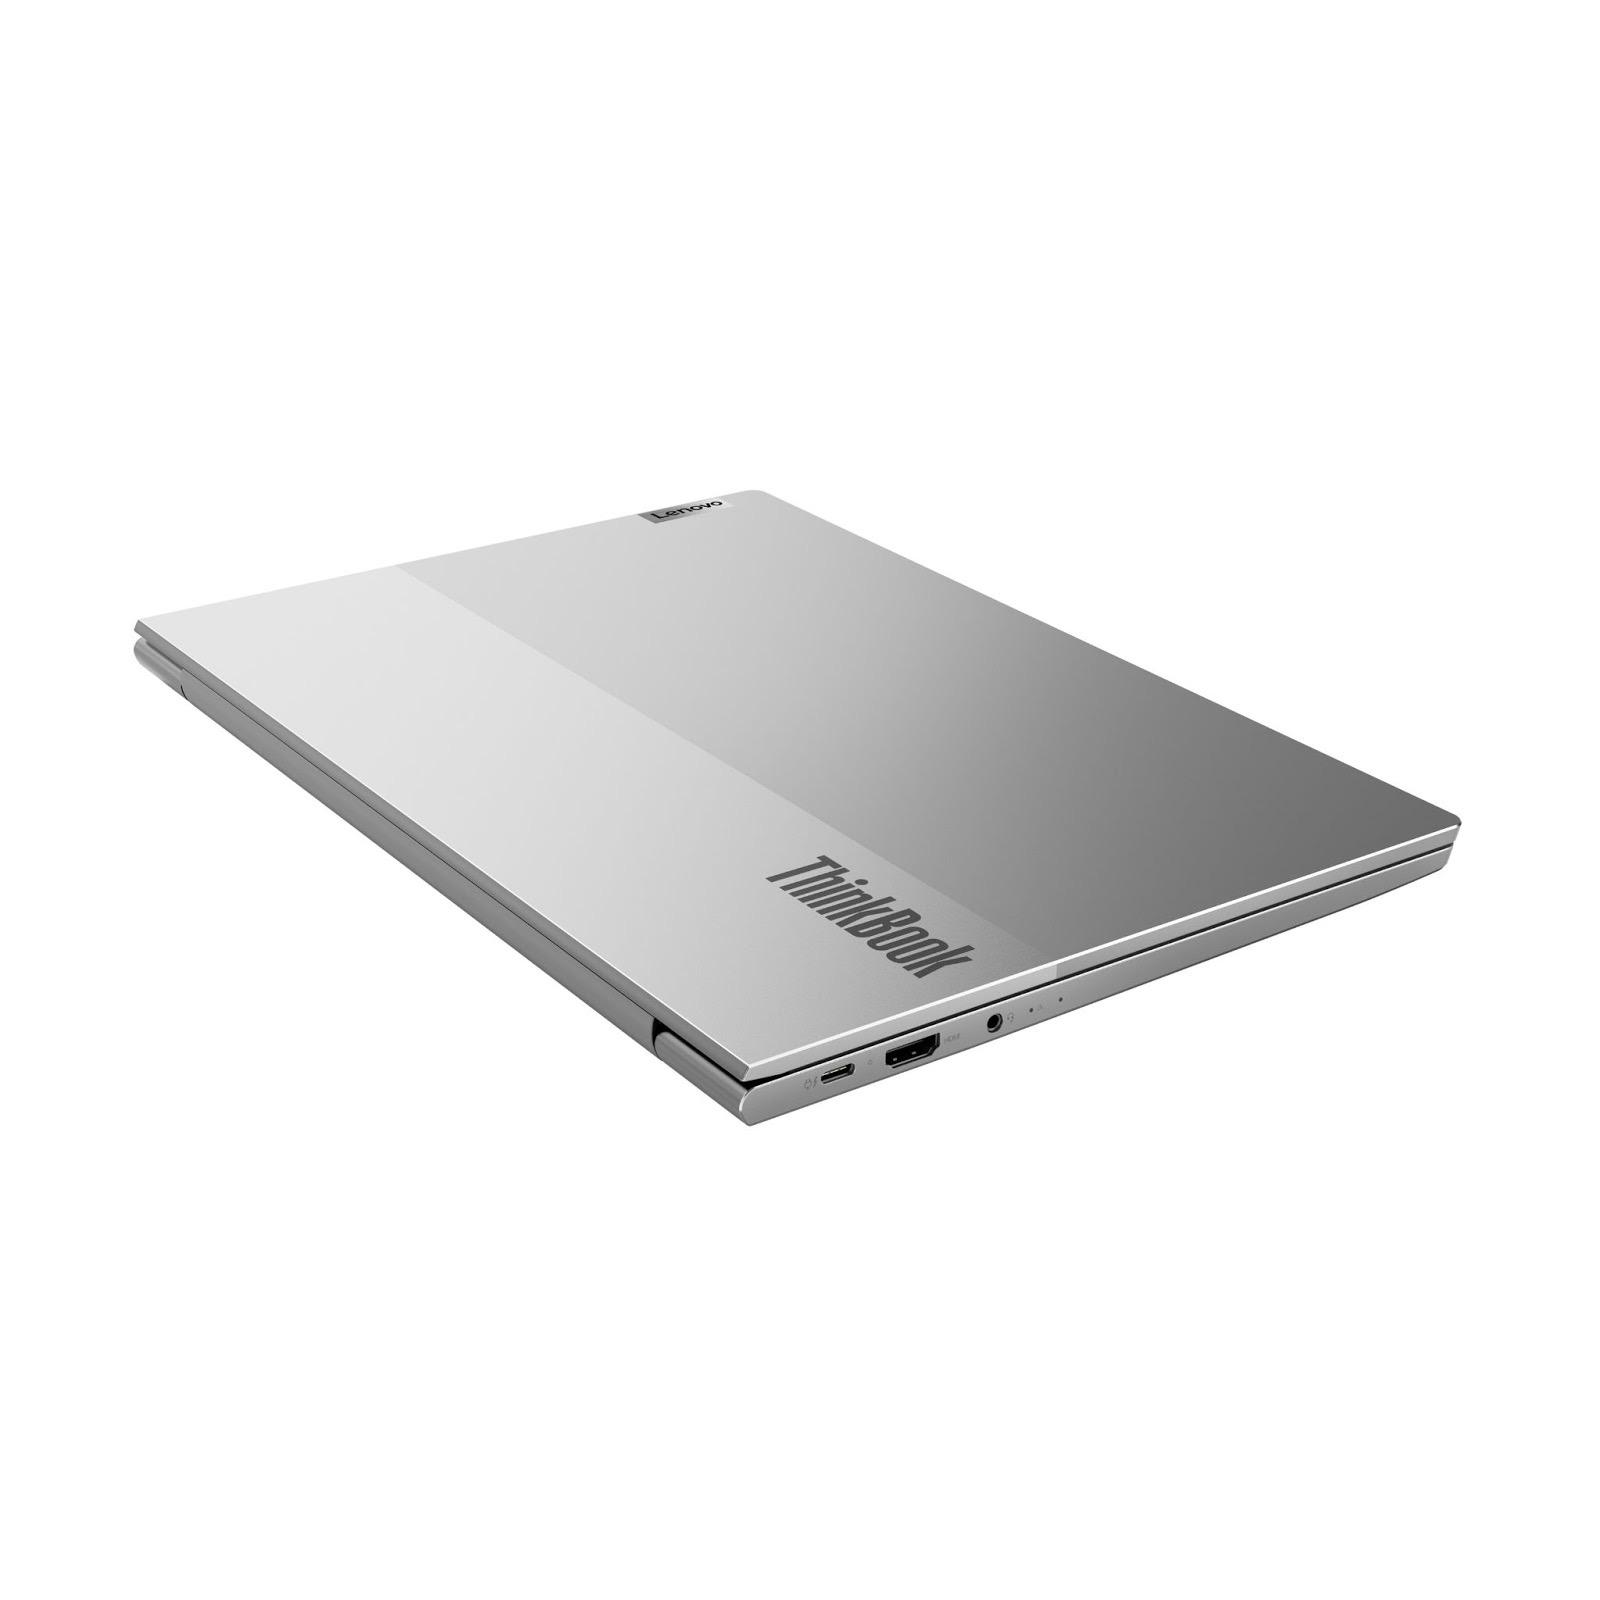 Фото 4. Ноутбук Lenovo ThinkBook 13s Gen 2 ITL (20V9003URU)